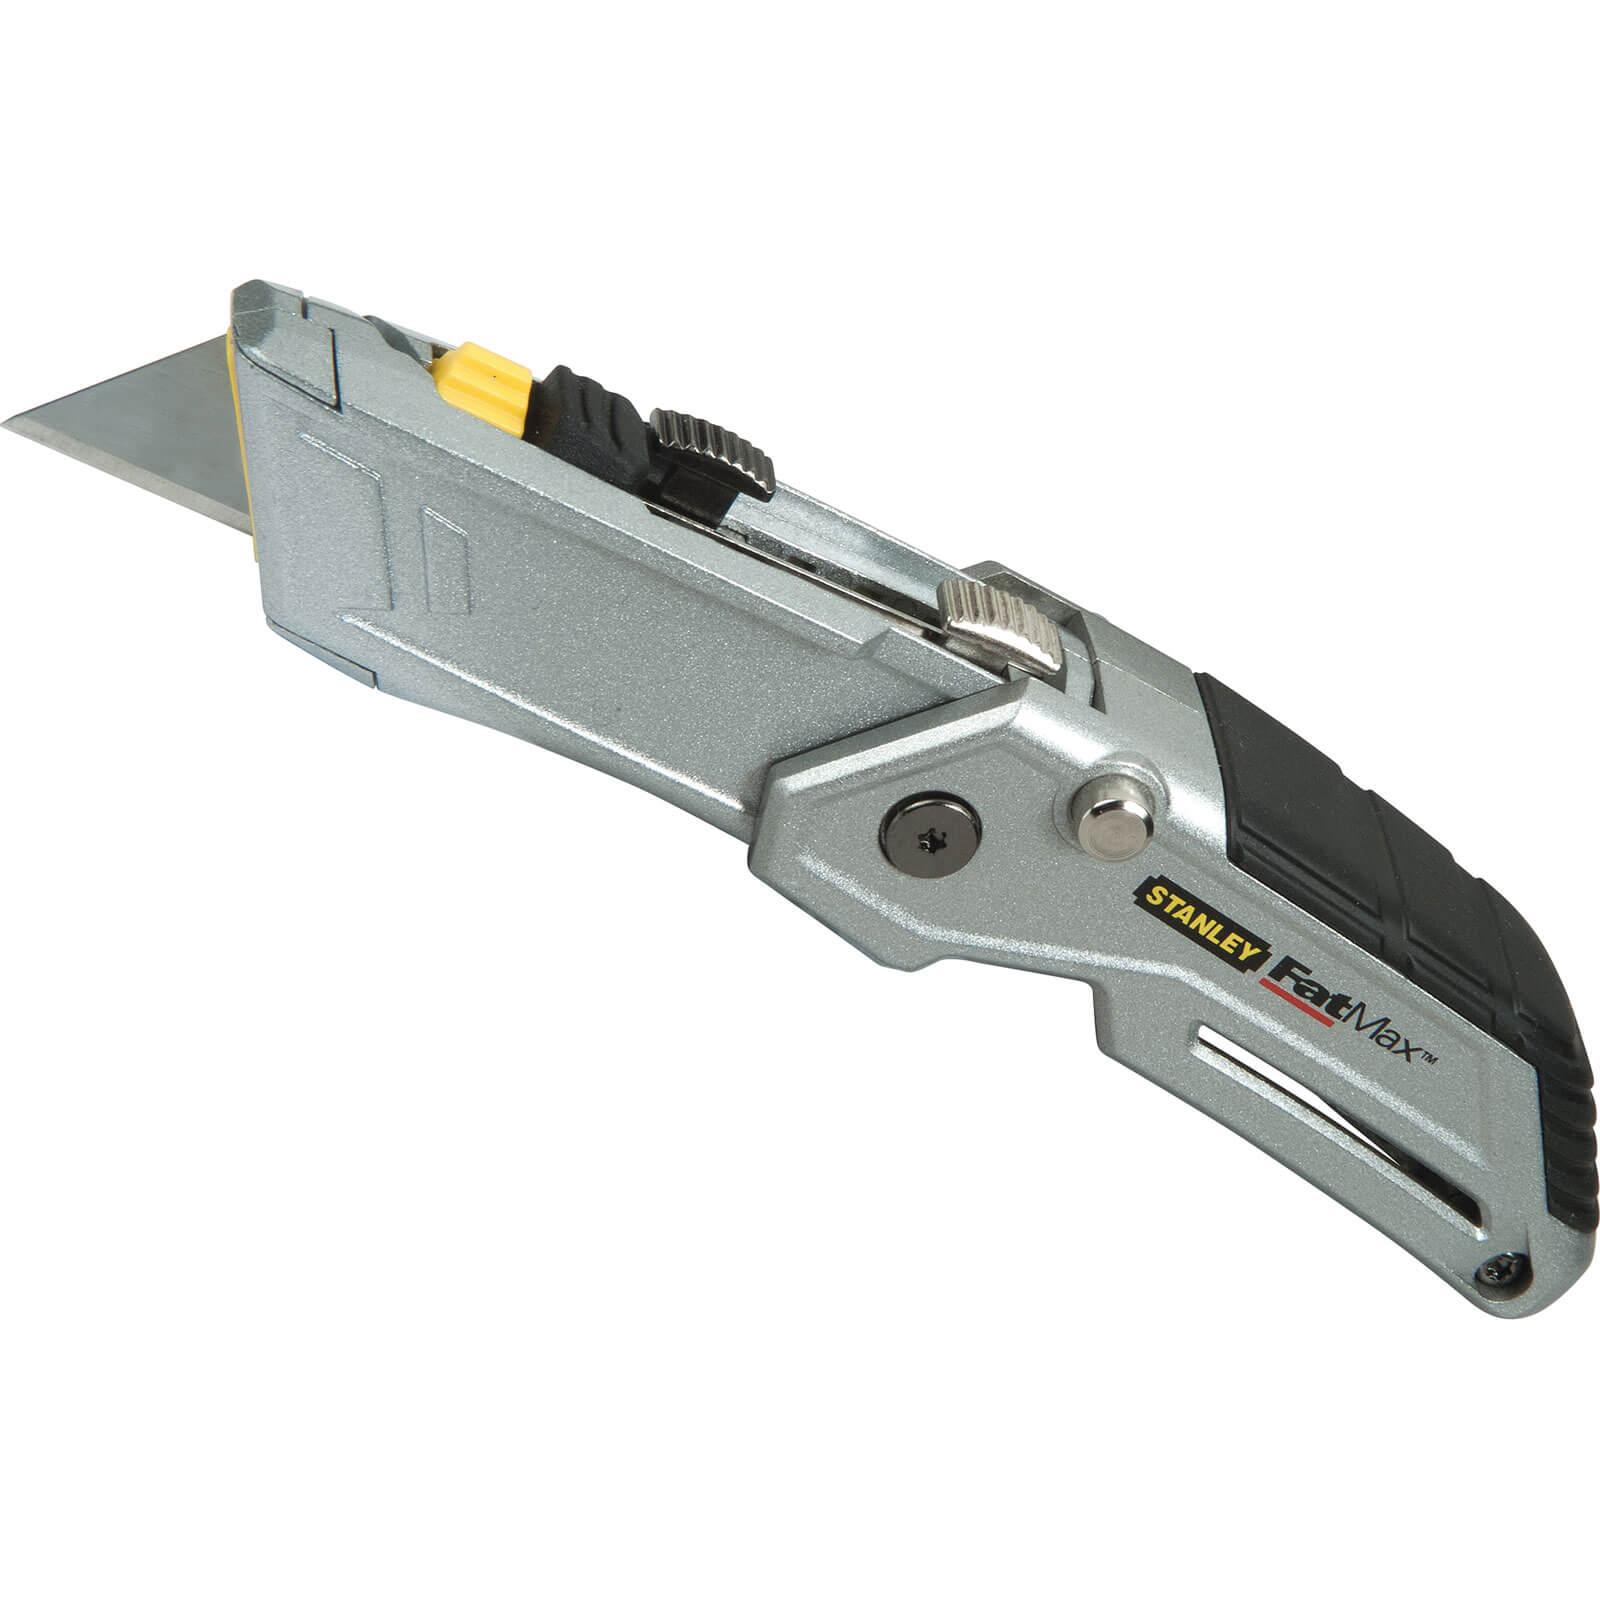 Stanley FatMax XTREME Folding Twin Blade Utiltiy Knife